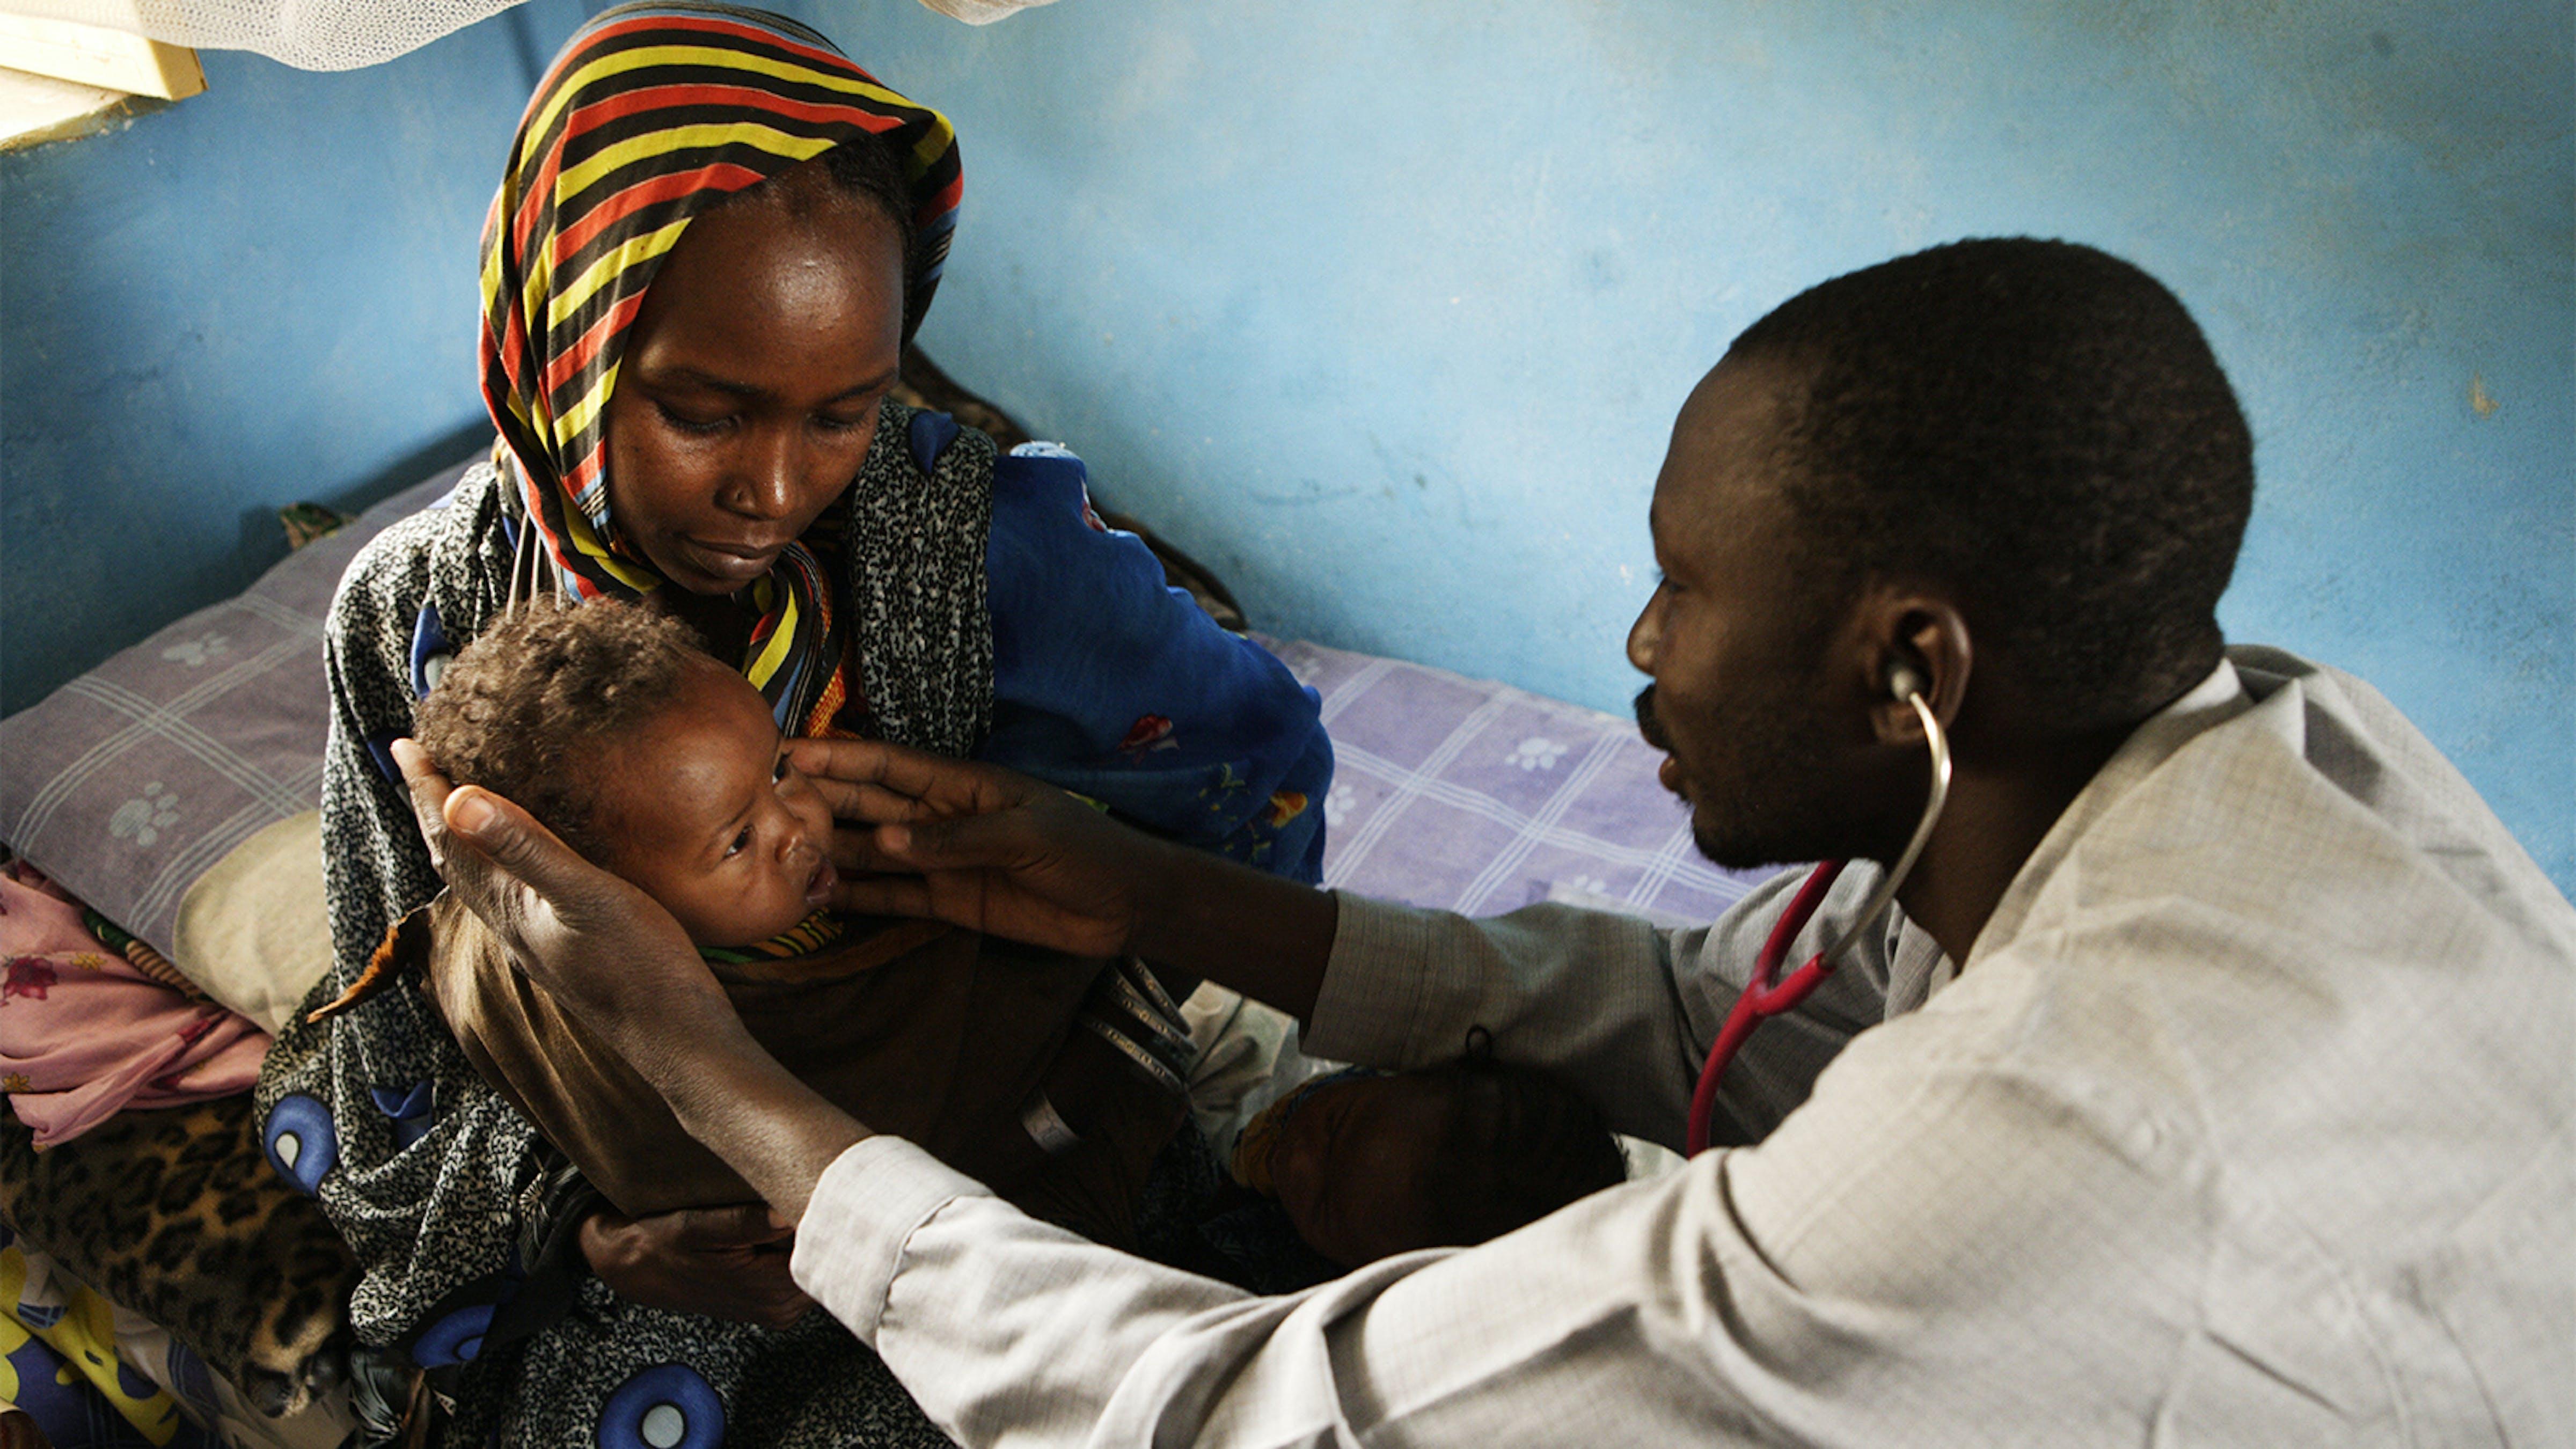 Bambina viene visitata da un medico